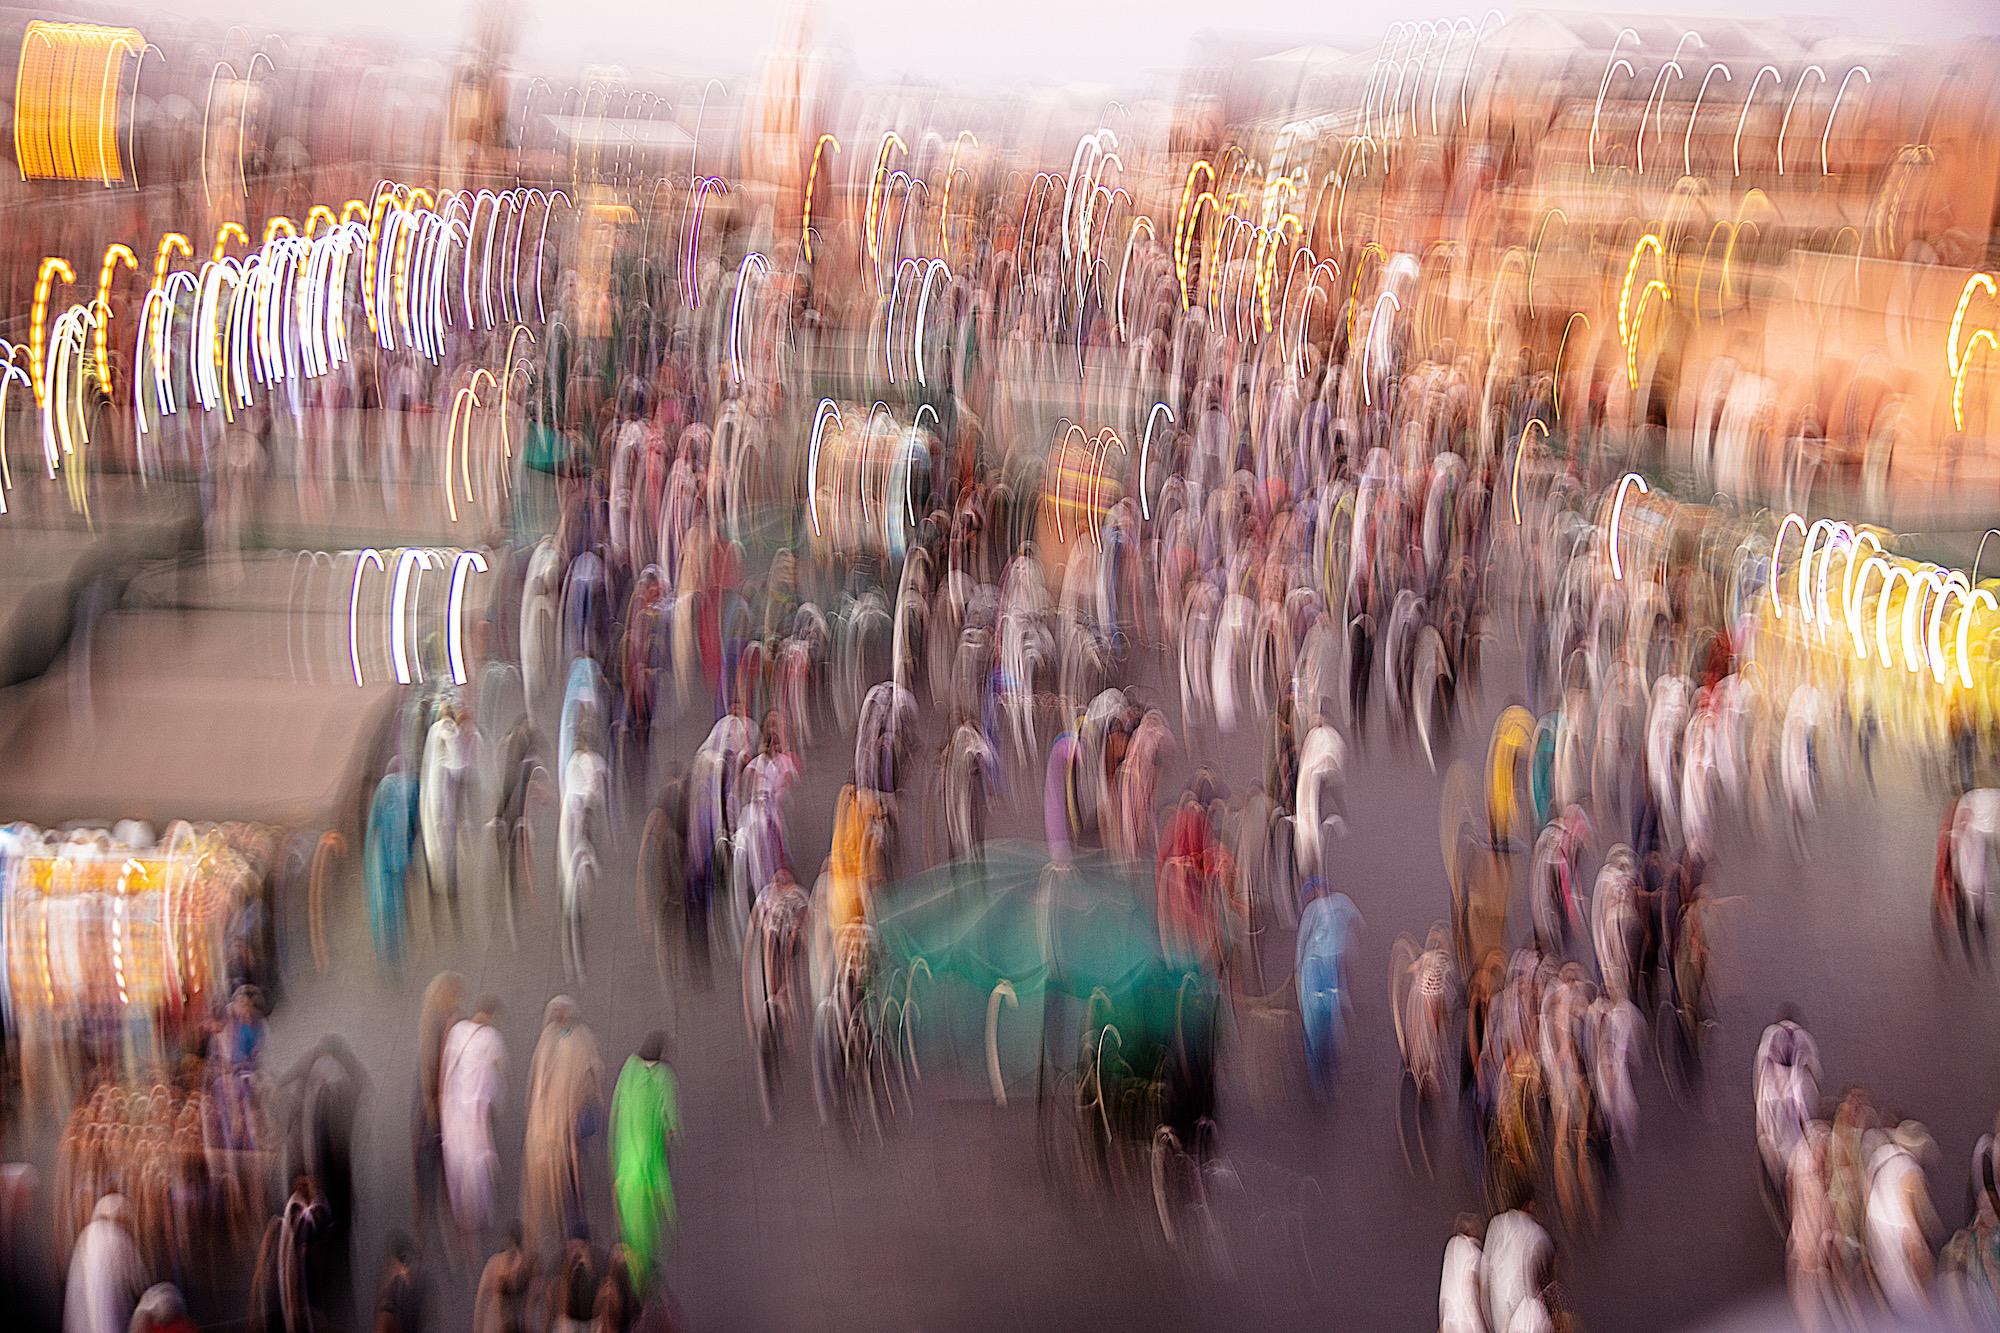 Morocco2_RP.JPG